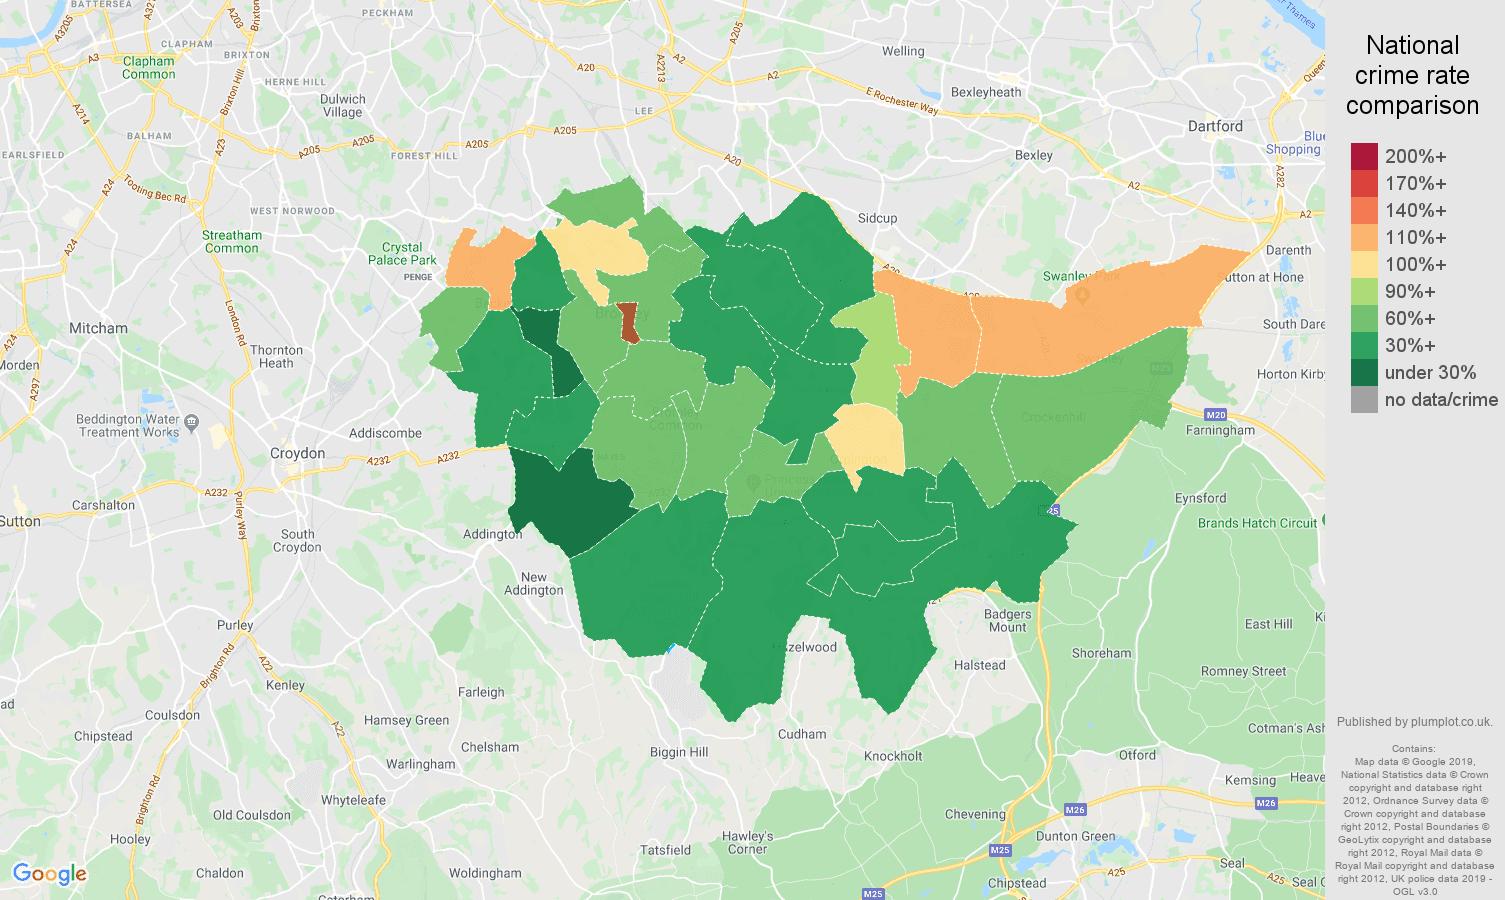 Bromley public order crime rate comparison map